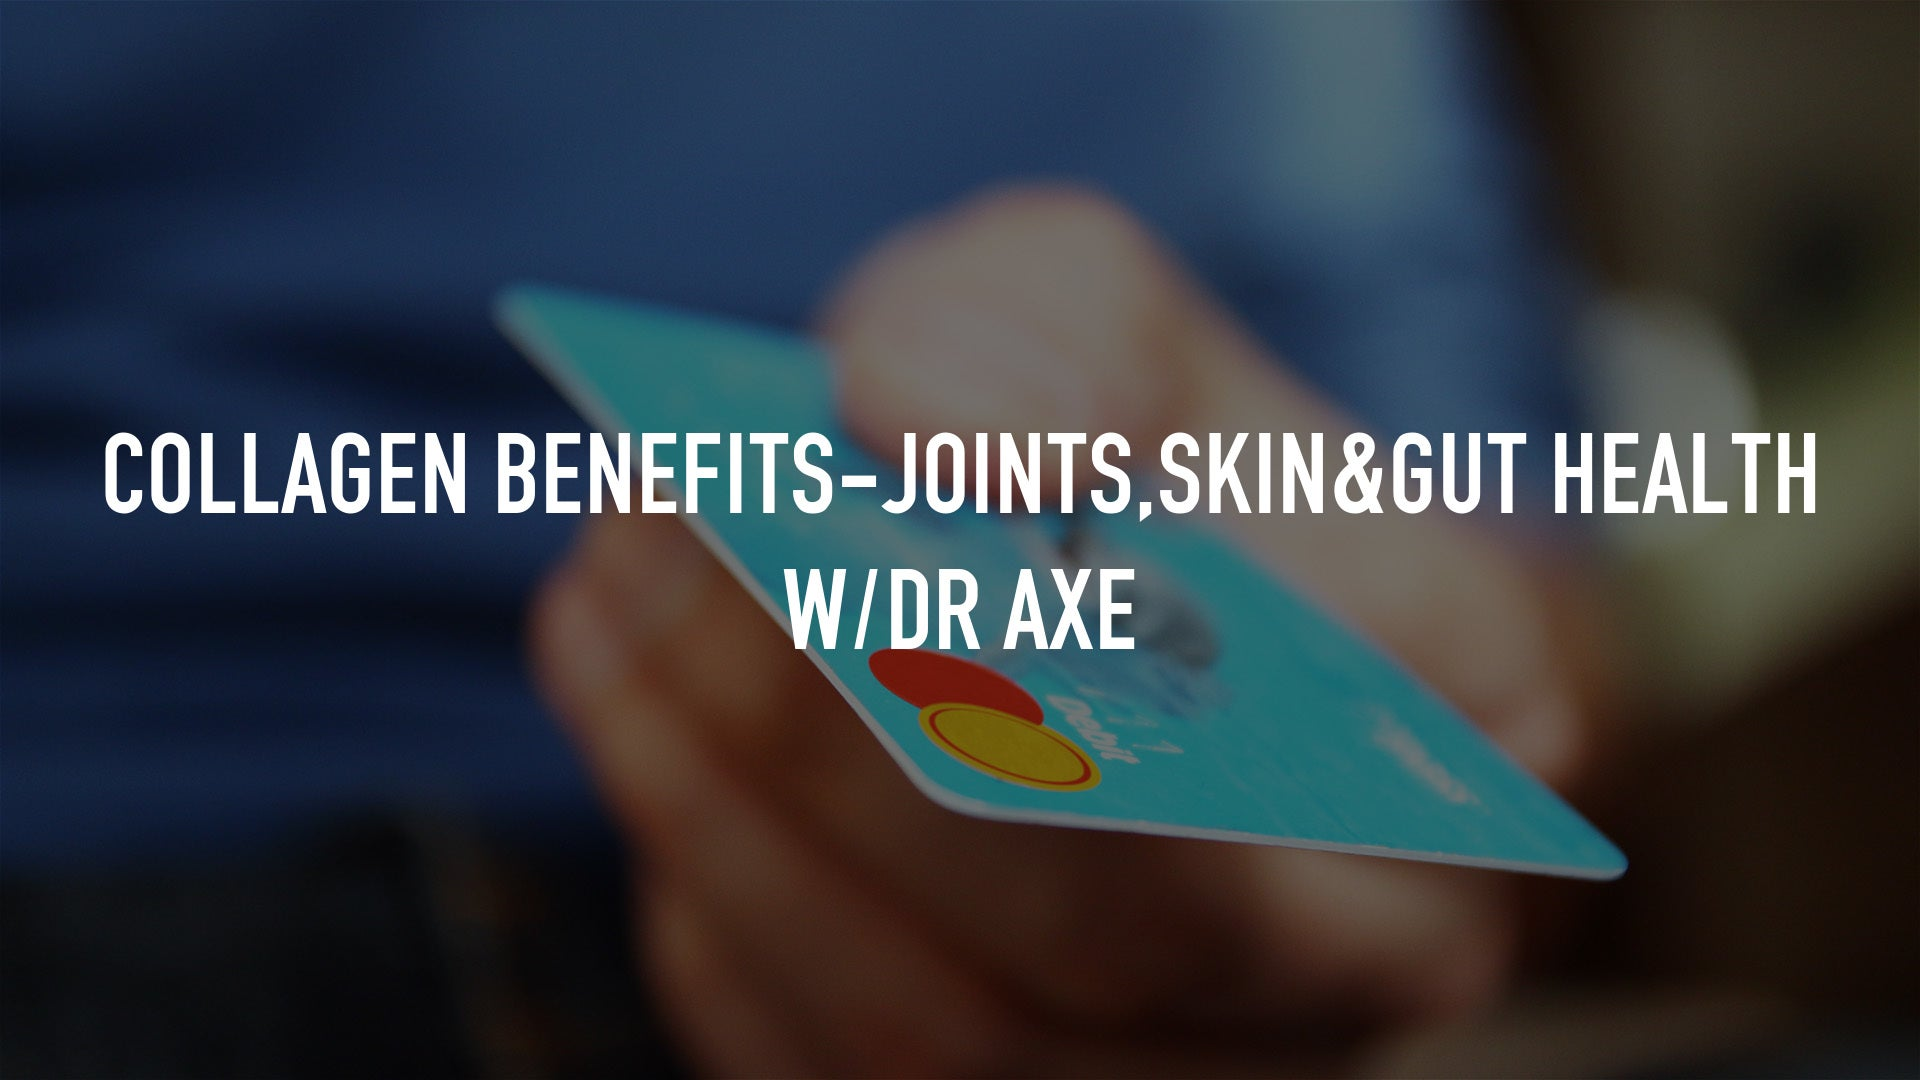 Collagen Benefits-Joints,Skin&Gut Health w/Dr Axe